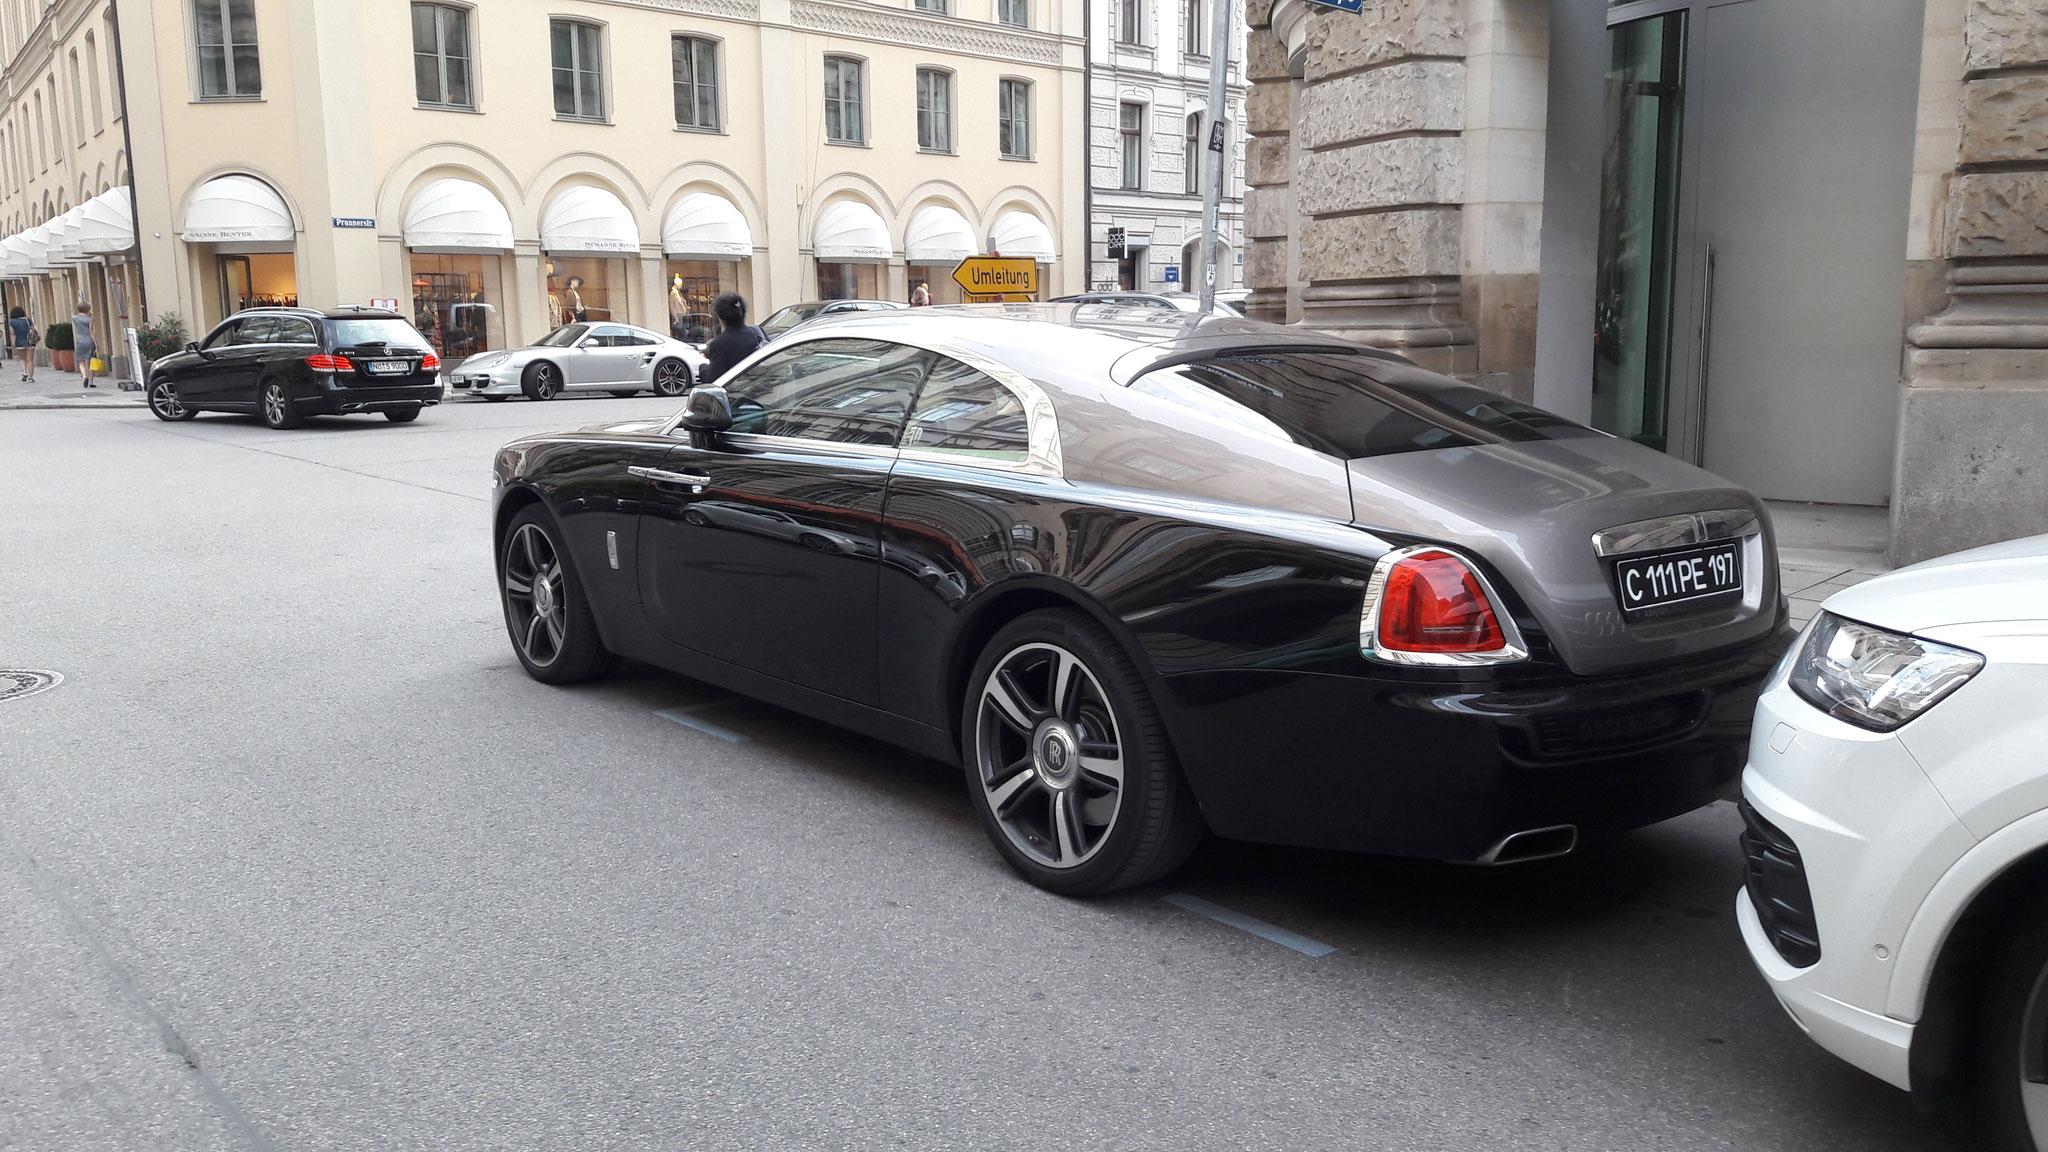 Rolls Royce Wraith - C-111-PE-197 (RUS)